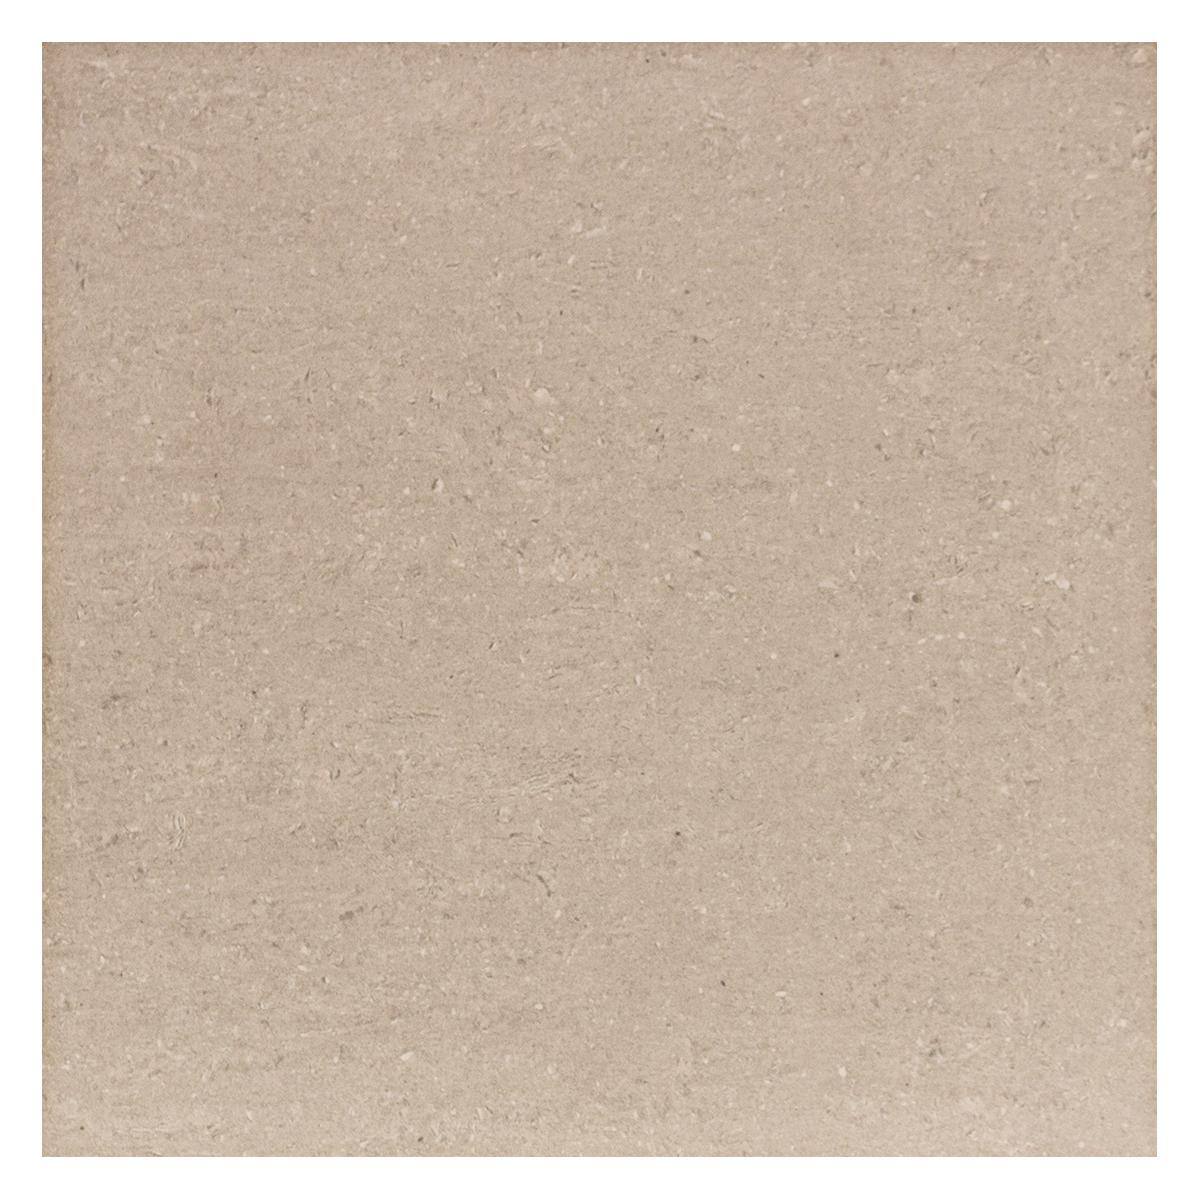 Porcelanato Doble Carga Gris Brillante - 60X60 cm - 1.44 m2